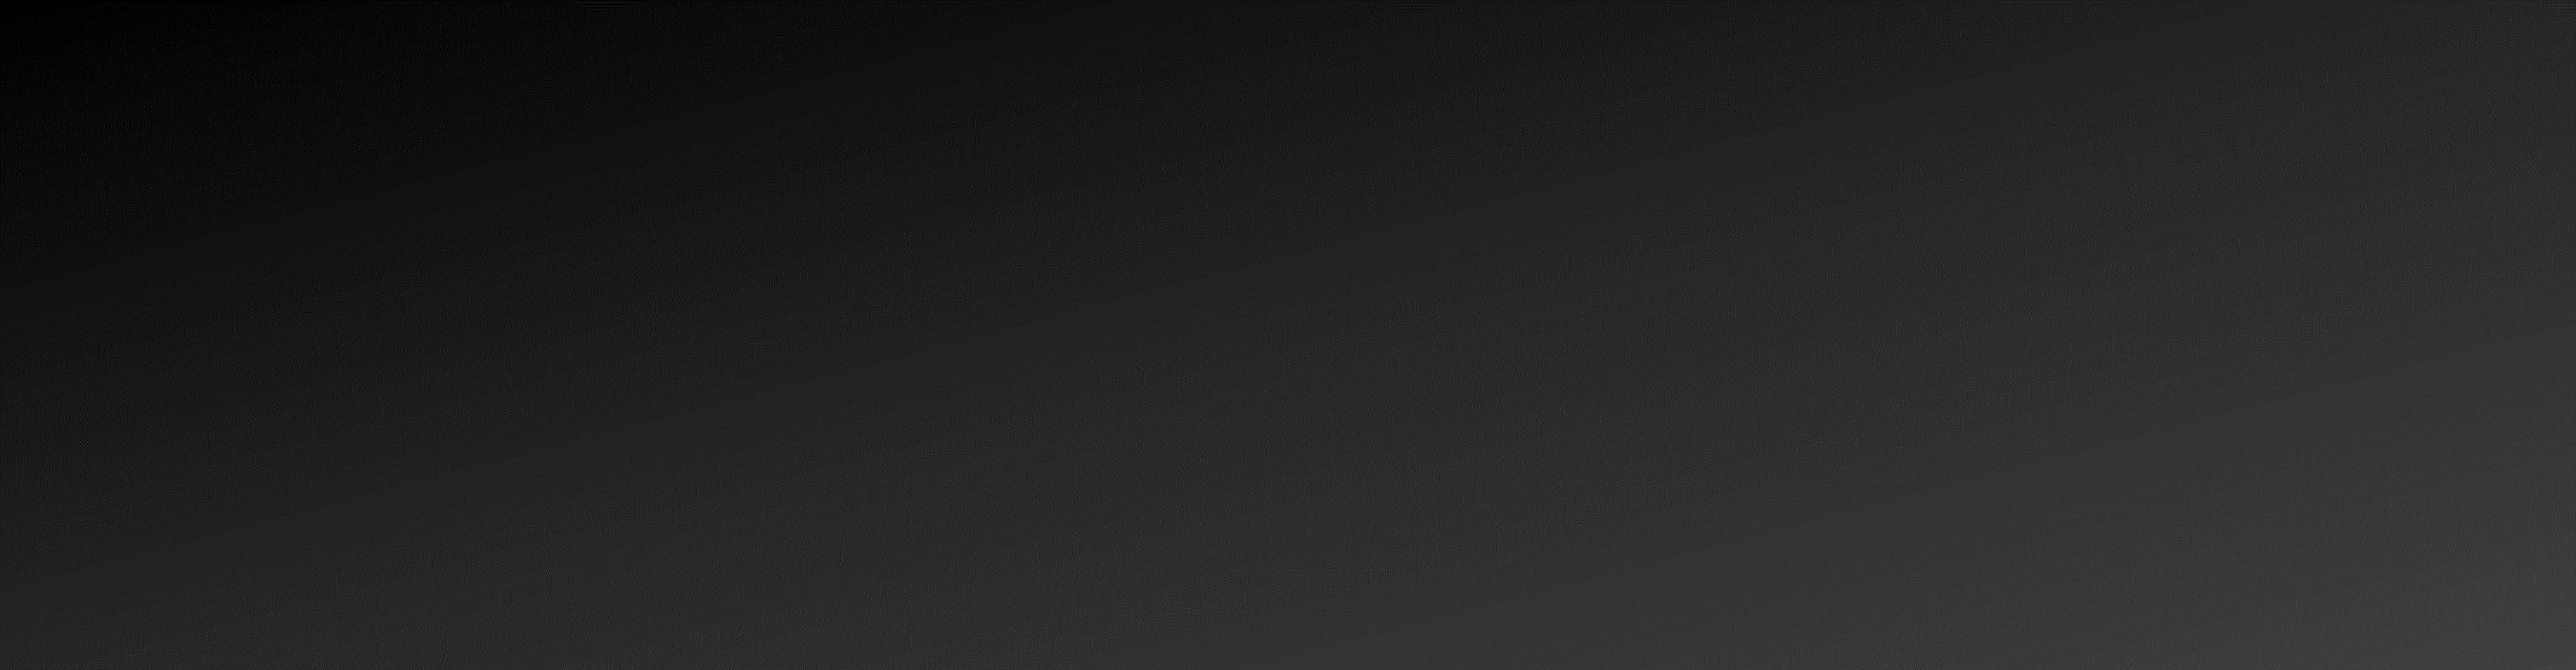 Black box gradient 2345x610